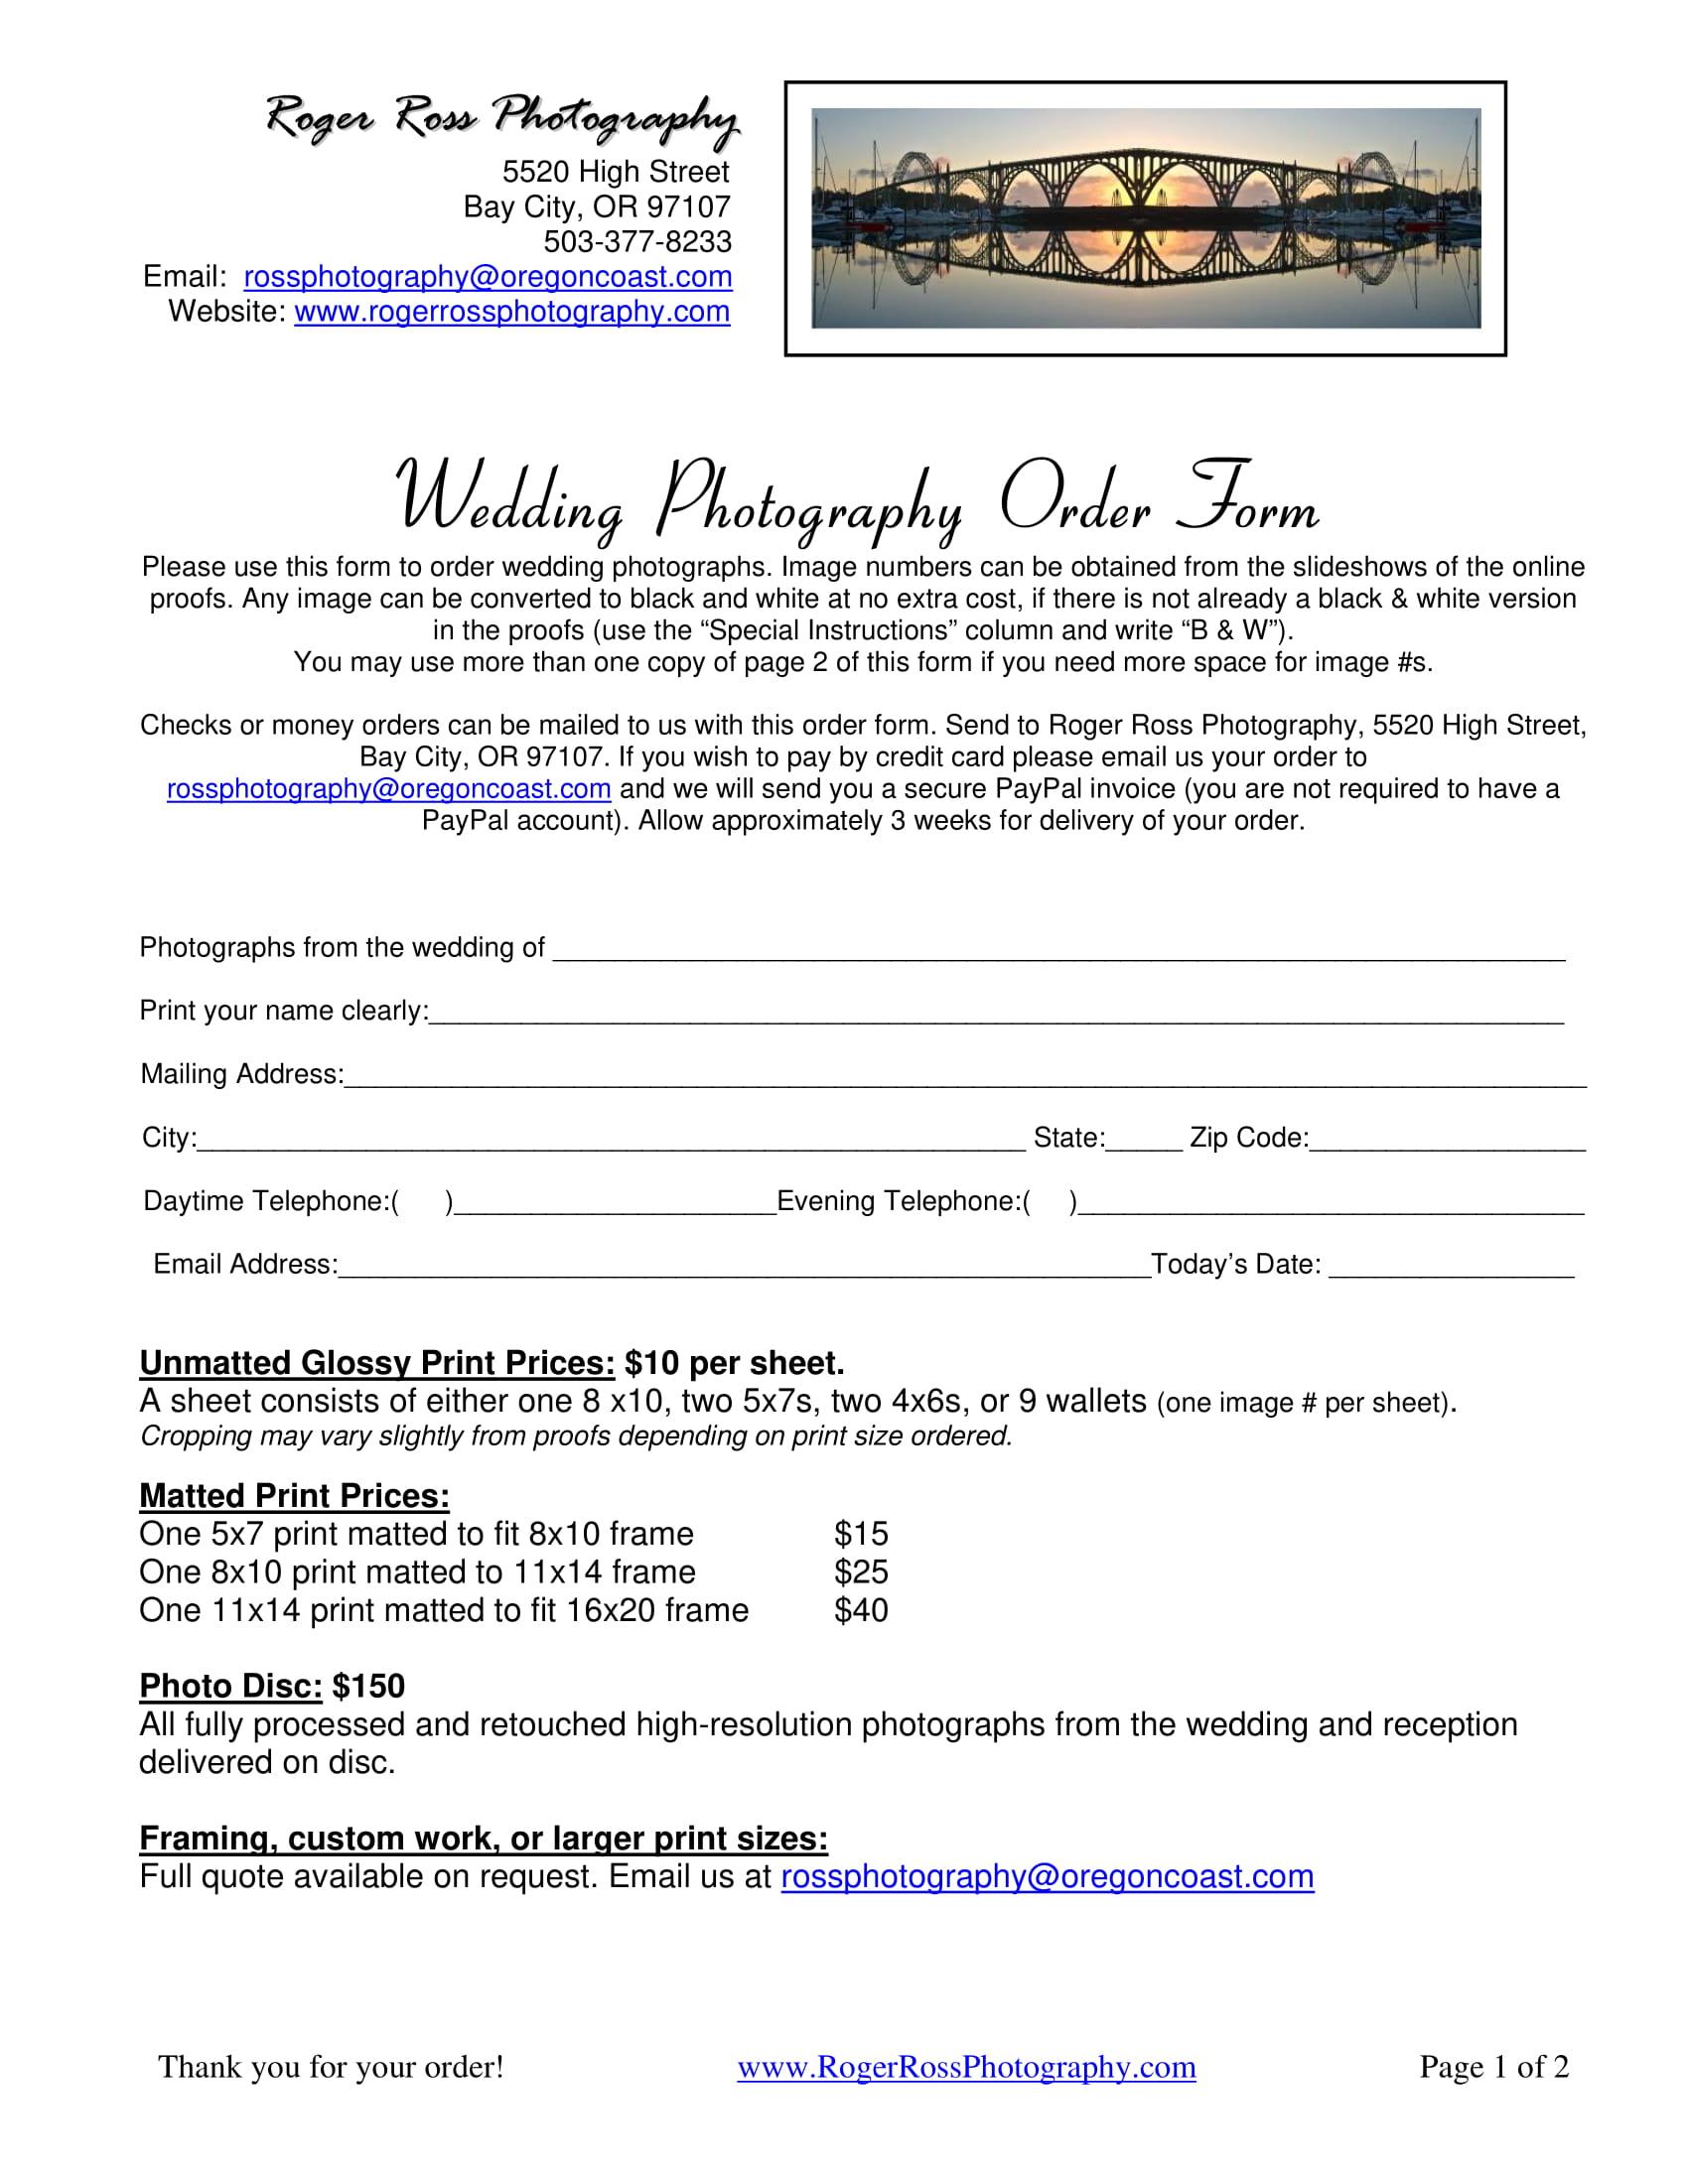 wedding photography order form 1